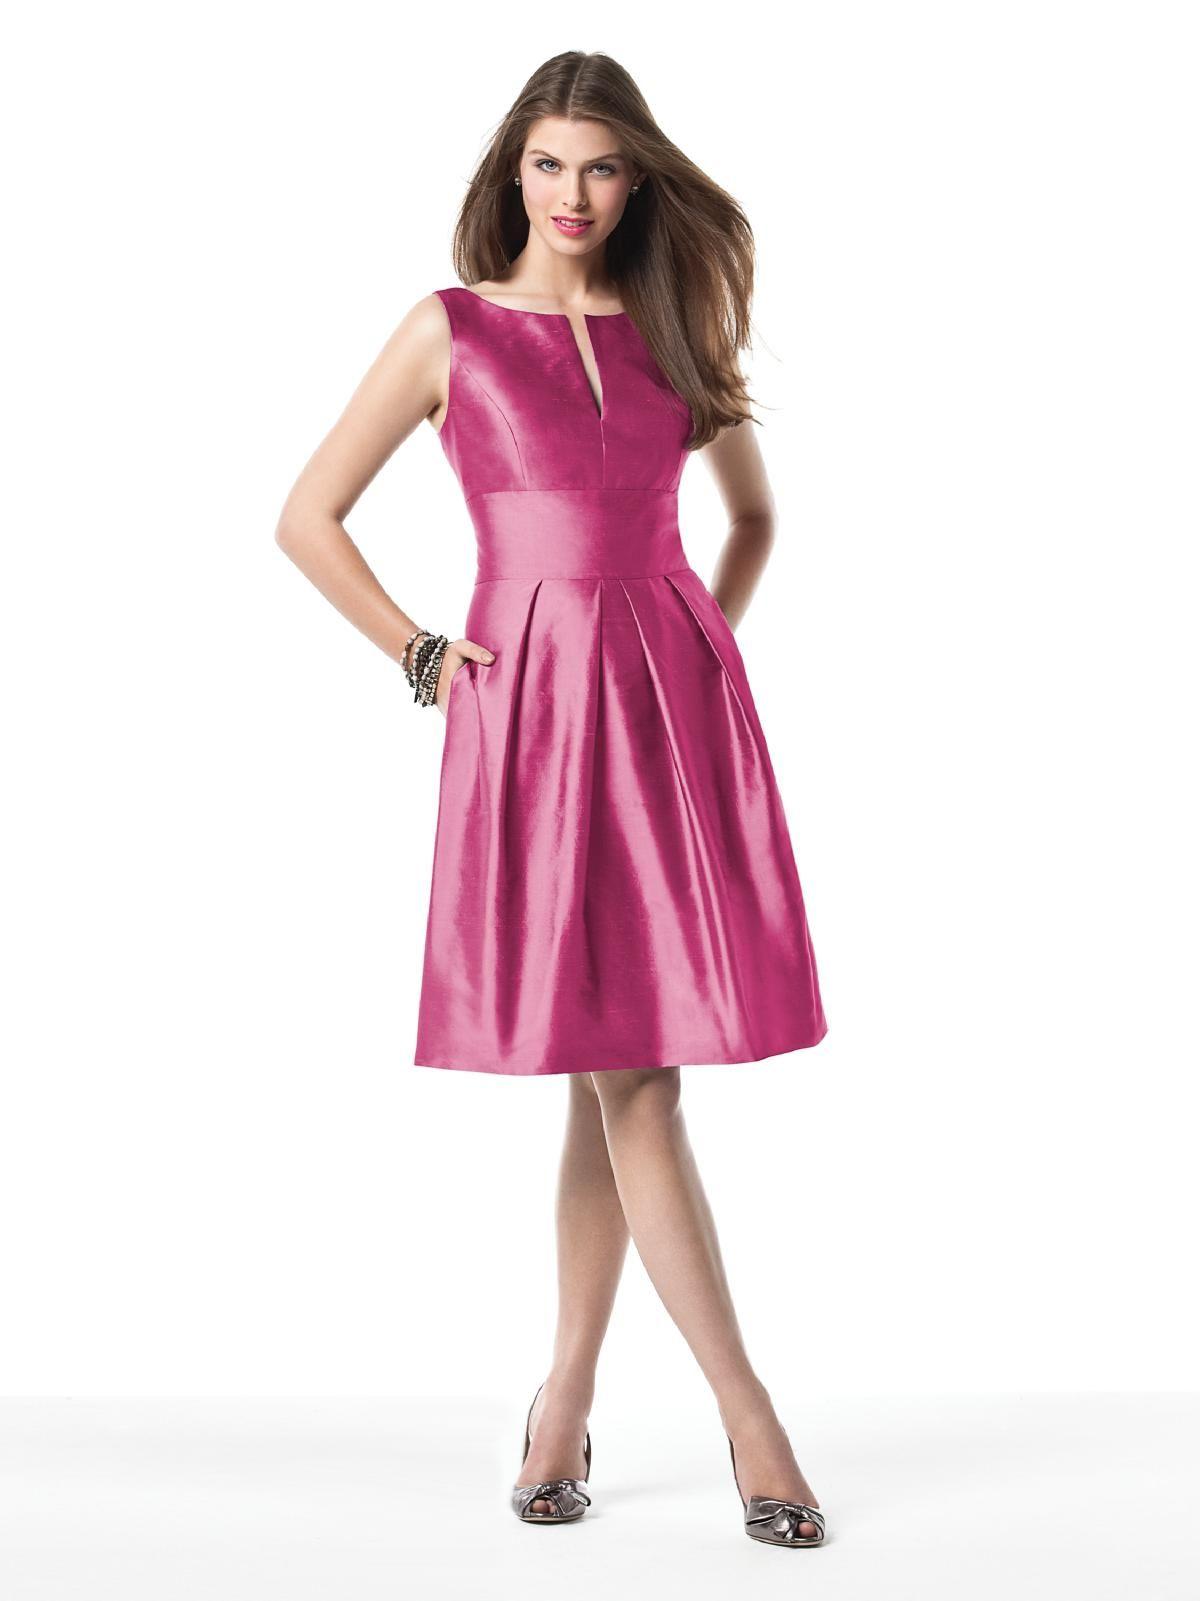 Dessy Collection 2818 Bridesmaids Dress | Bridesmaids Dresses ...